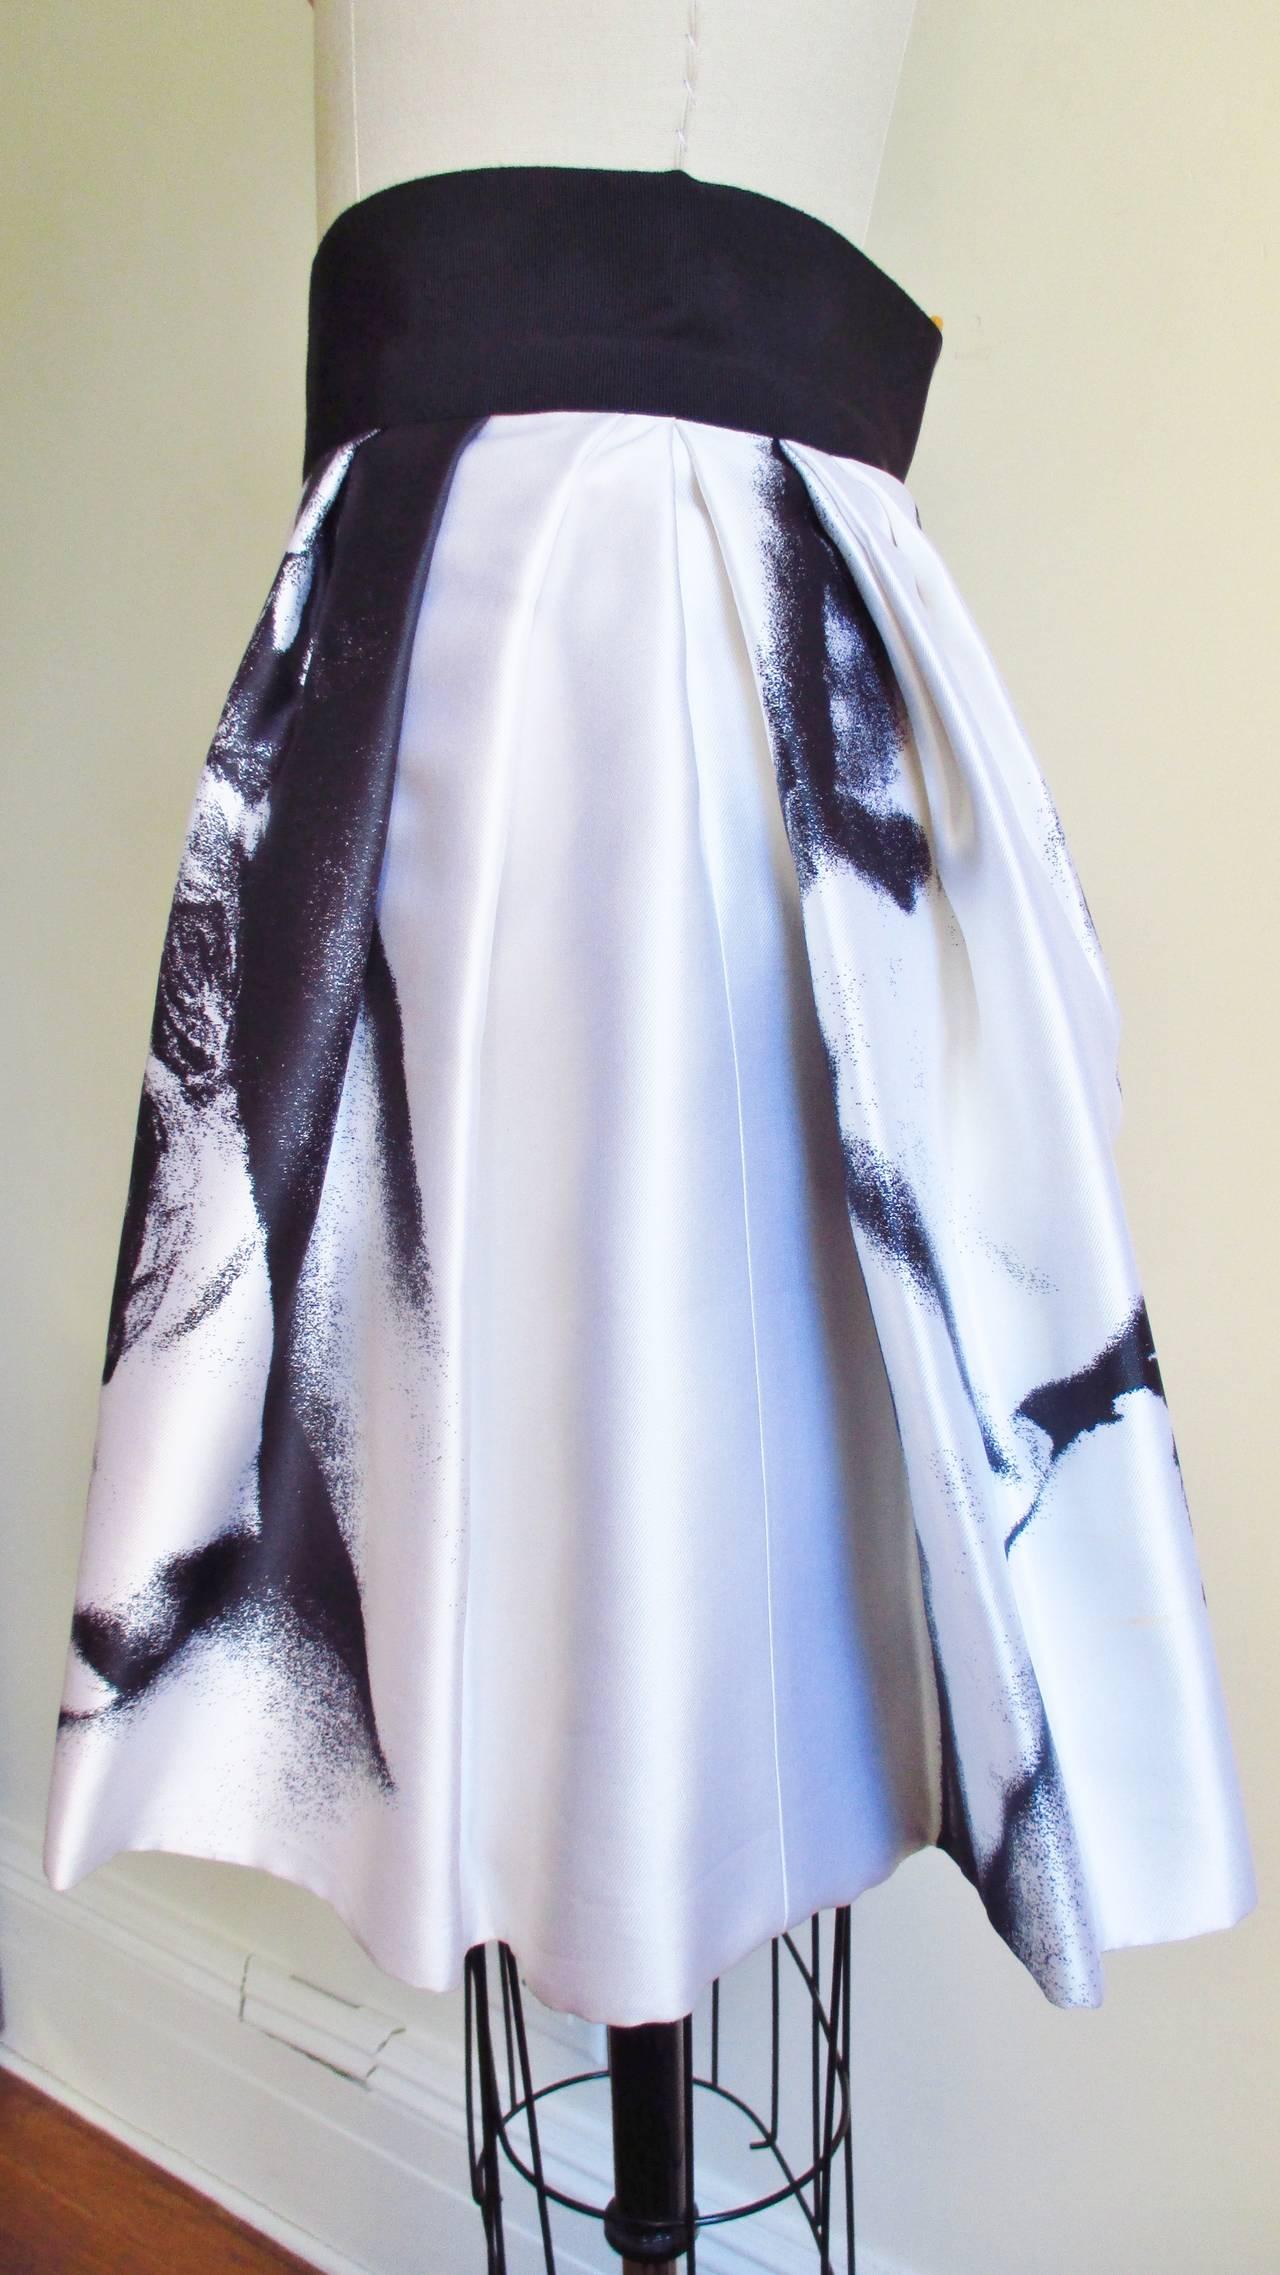 Iconic Marilyn Monroe Dolce & Gabbana Screen Print Skirt 7